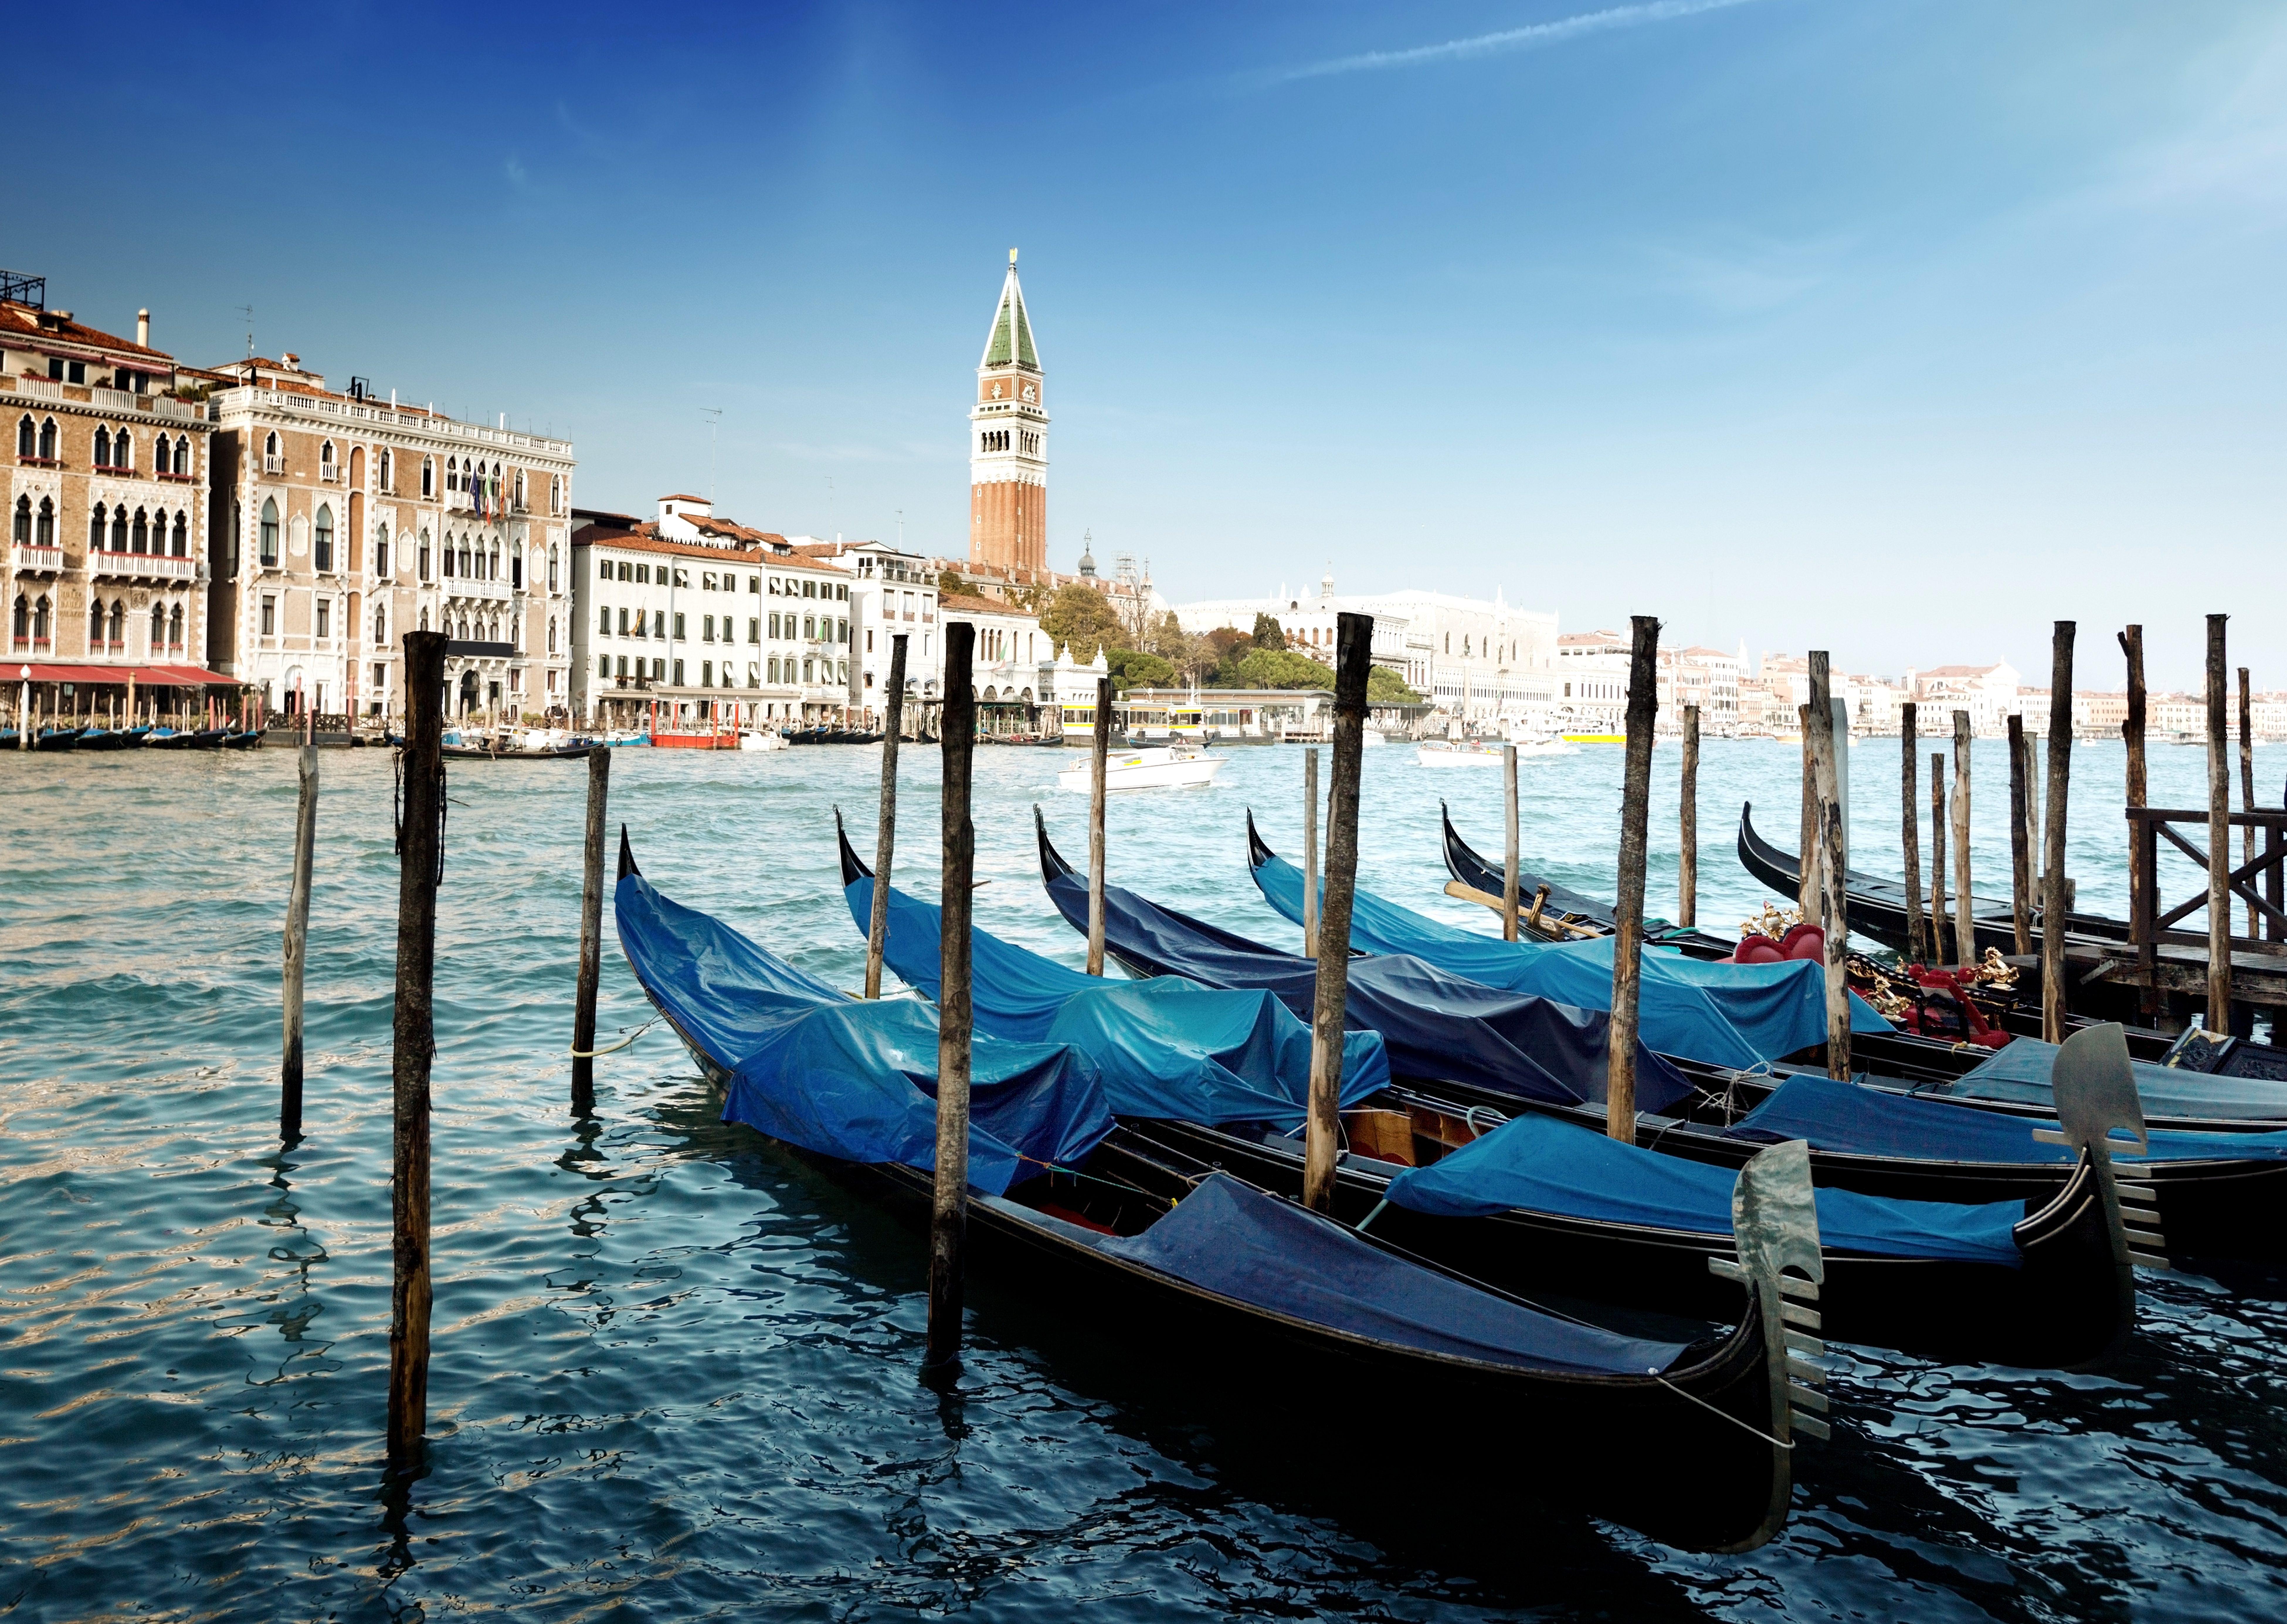 Обои гондолы на причале, город Венеция ...: xorst.ru/oboi?view=detail&id=3528